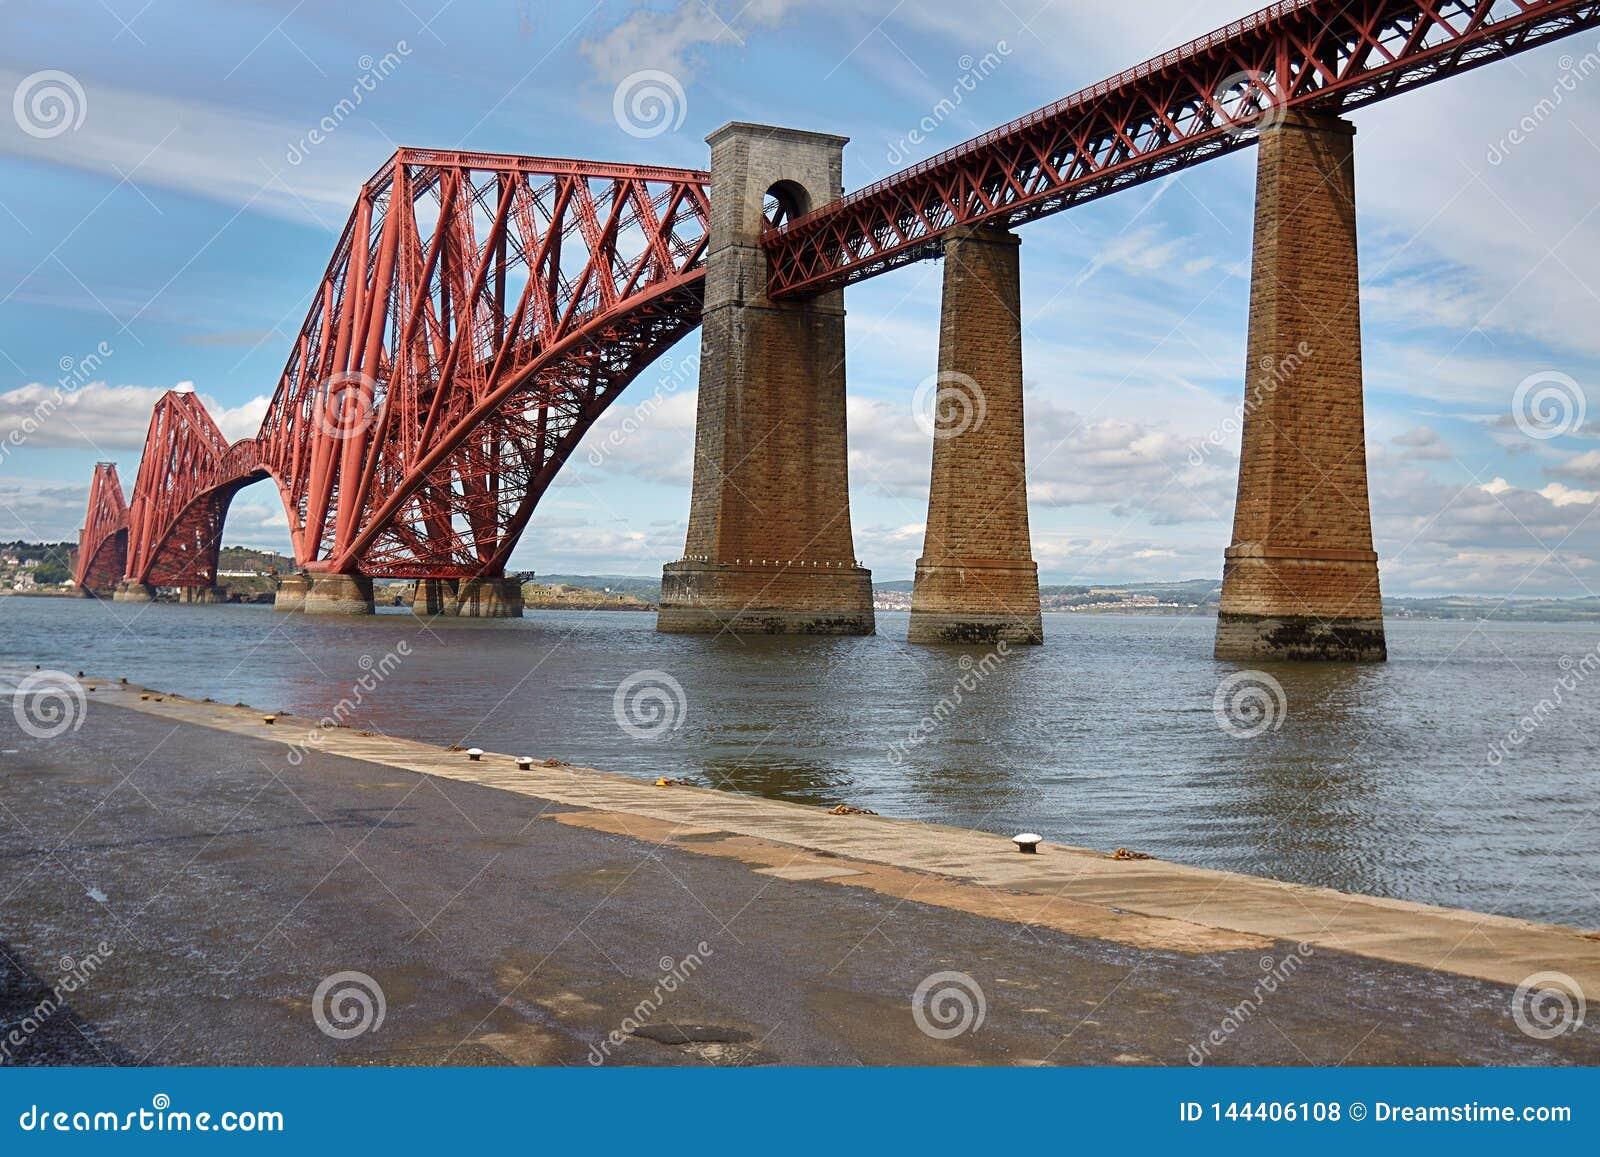 Edimburg, Szkocja czwarty most